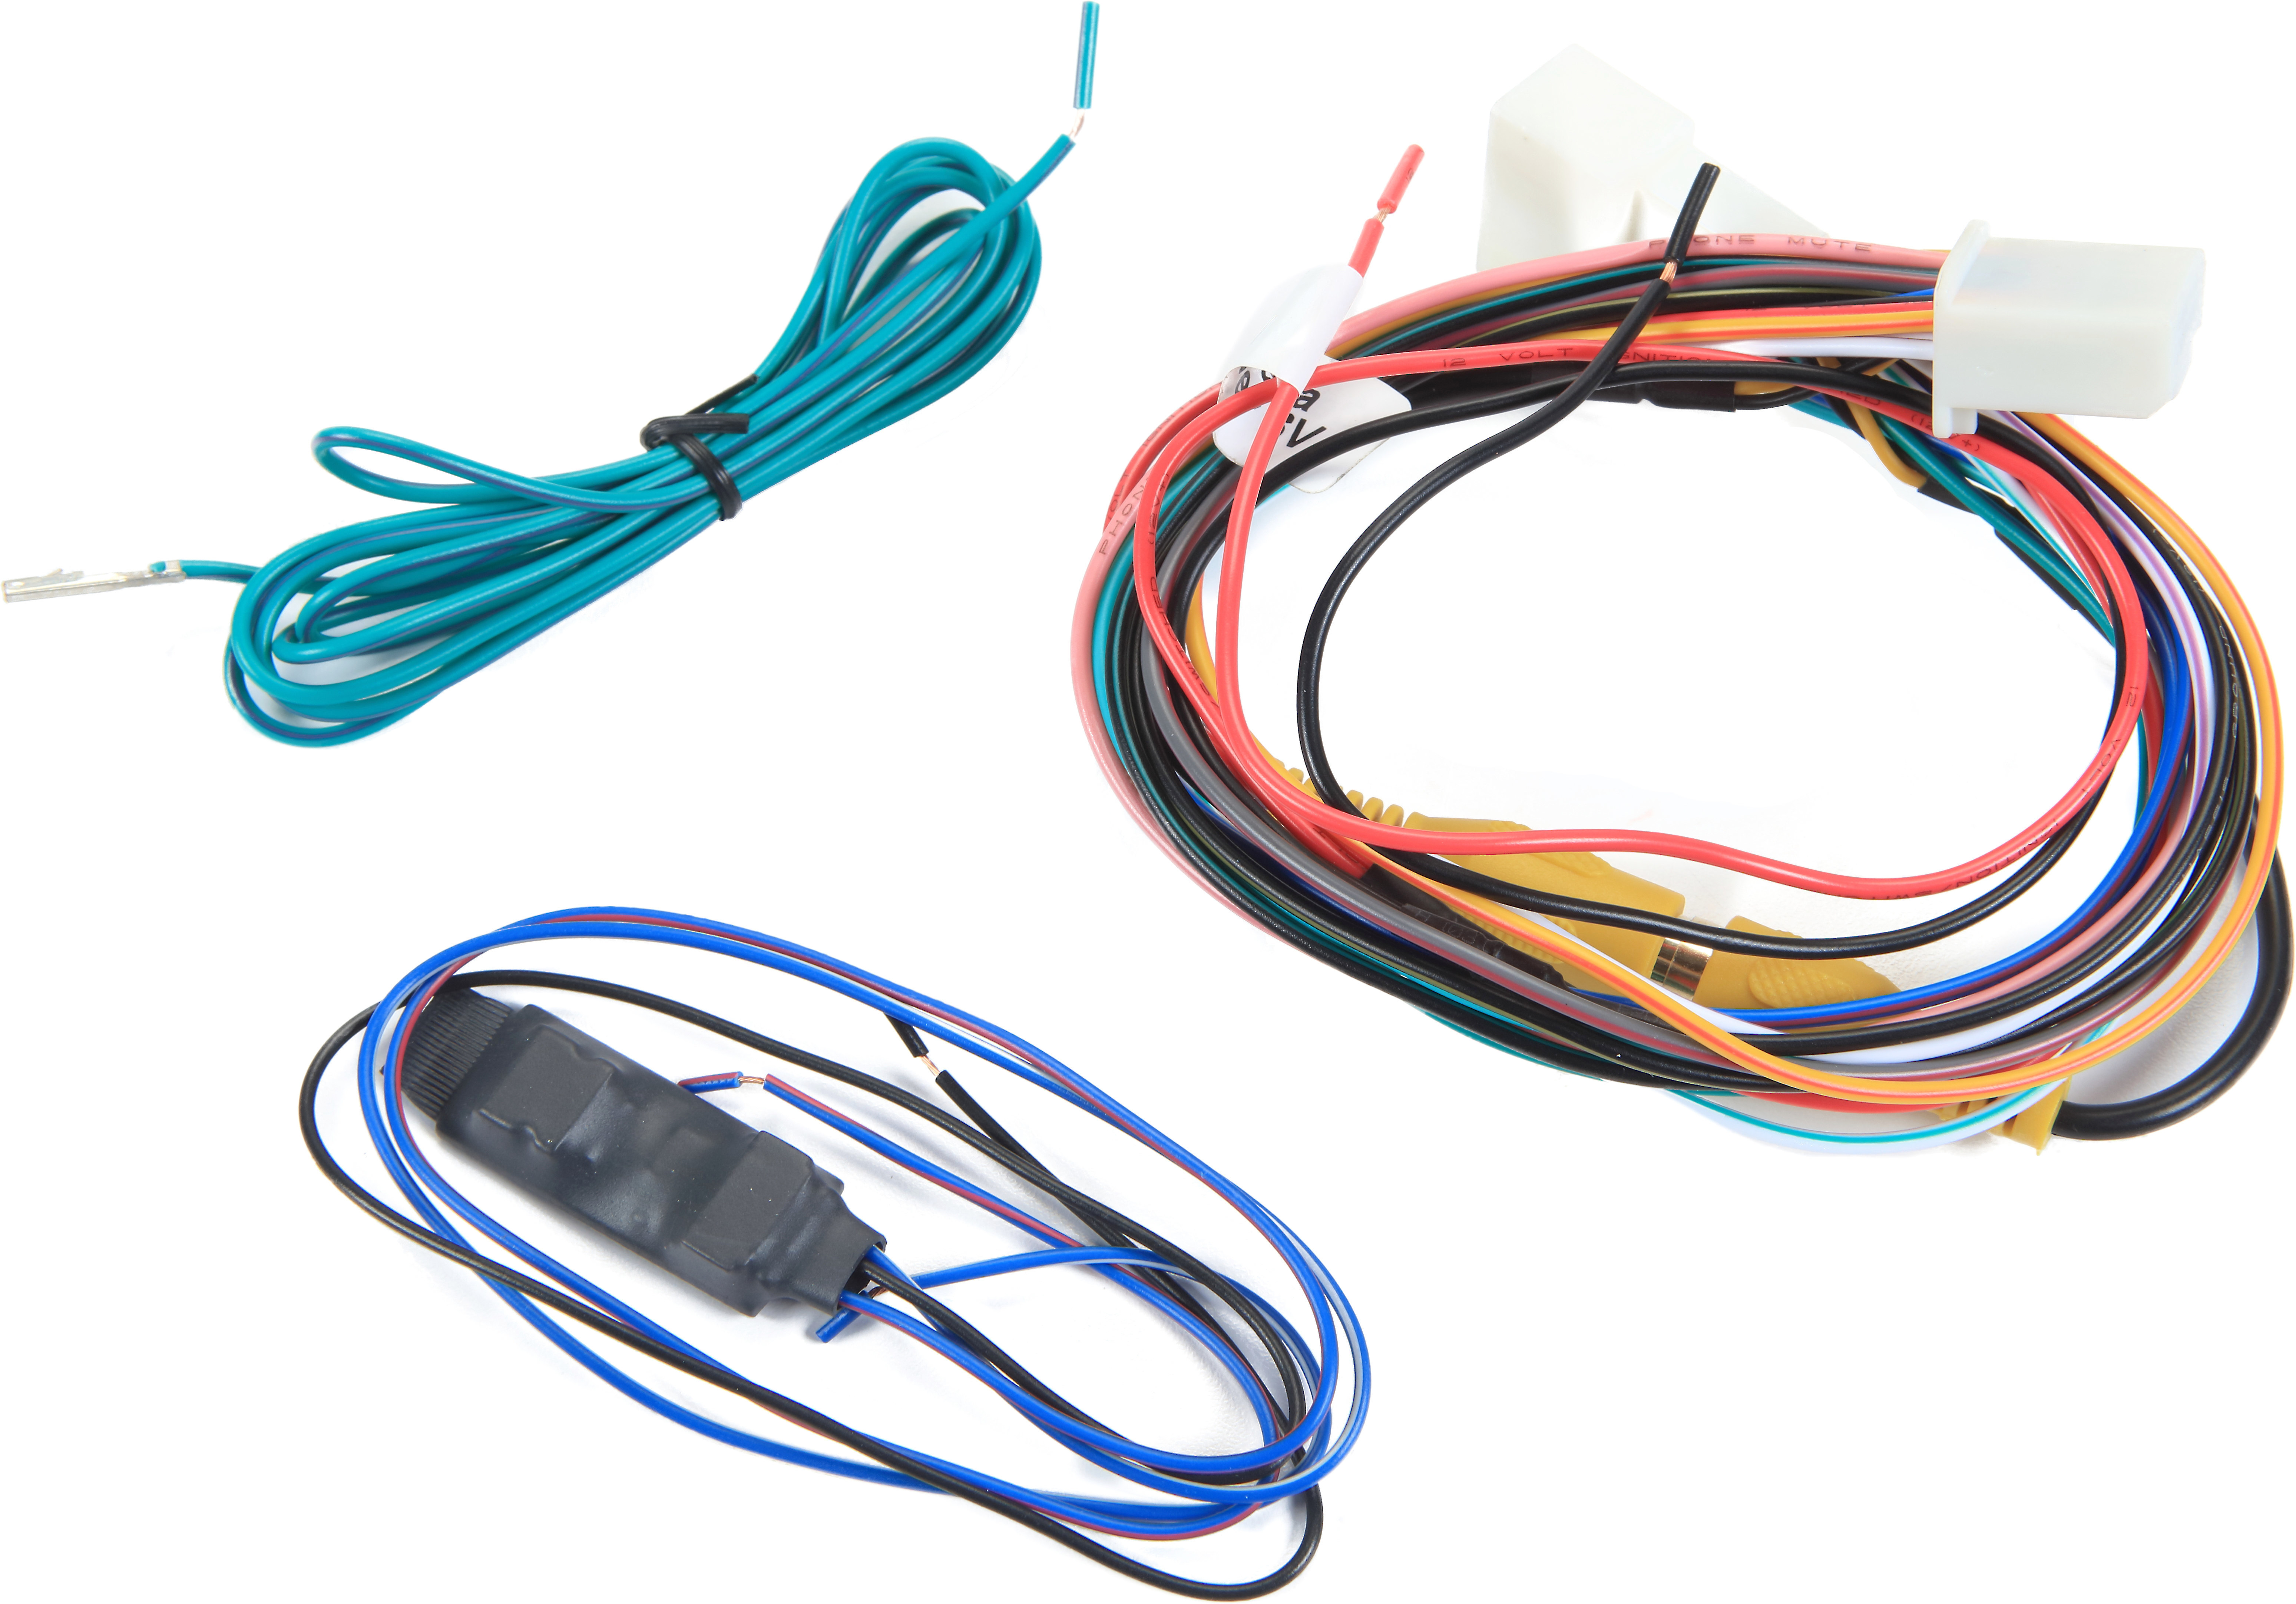 Kia Optima Wiring Diagram For Door Locks Get Free Image About Wiring